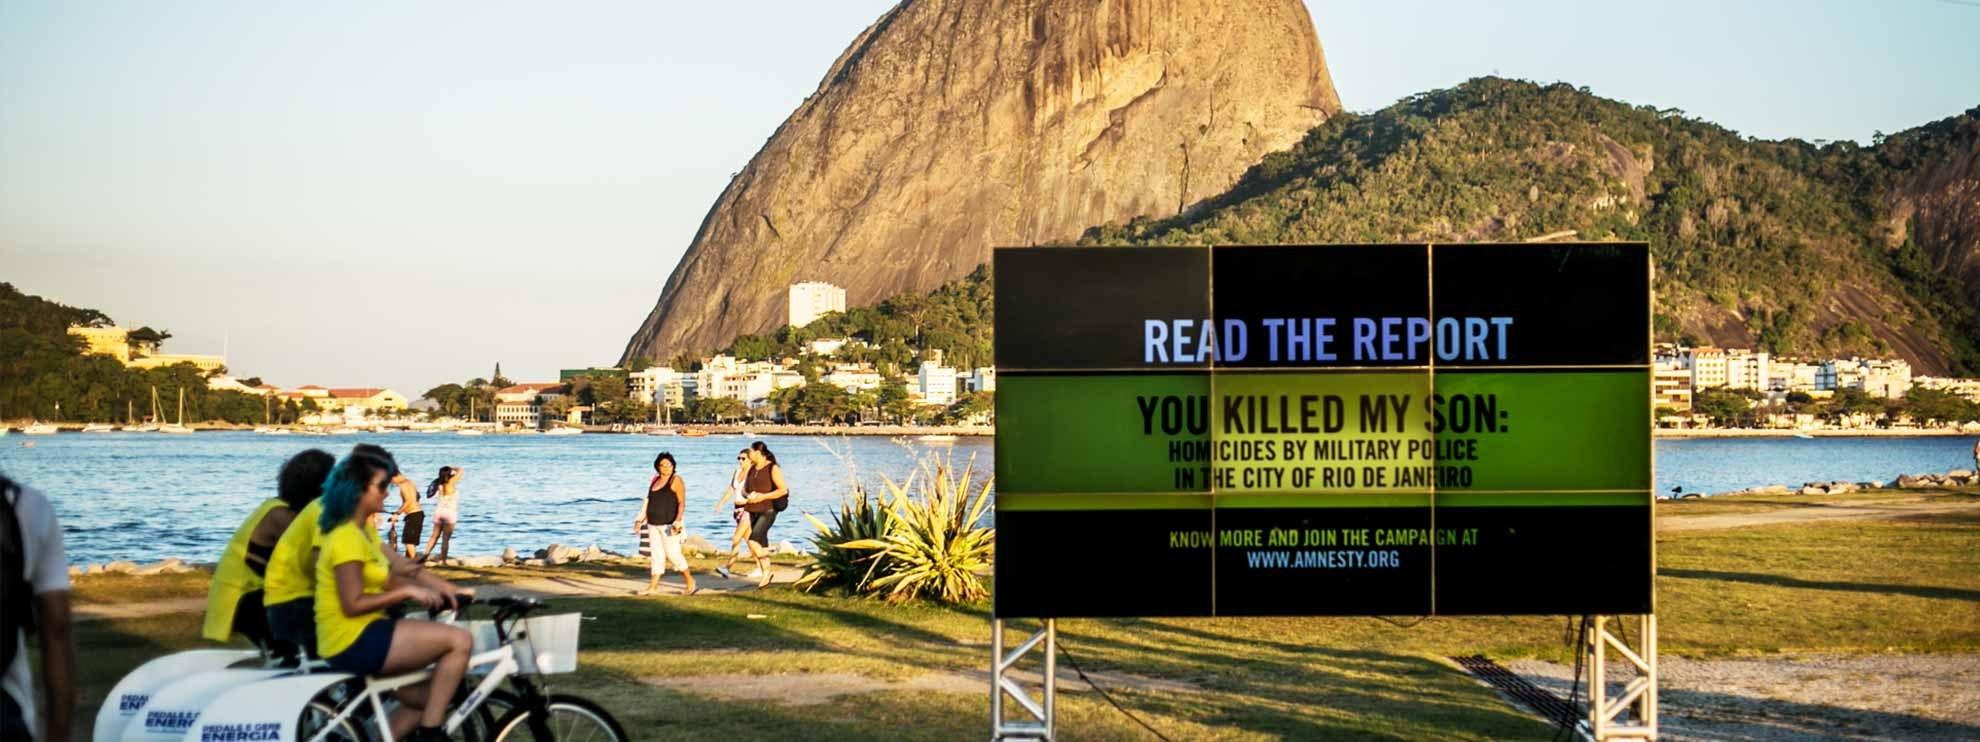 Action lors de la publication du rapport d'Amnesty: «You killed my son - Homicides by military police in the city of Rio de Janeiro» © Thiago Dezan/ Amnistia Internacional Brasil